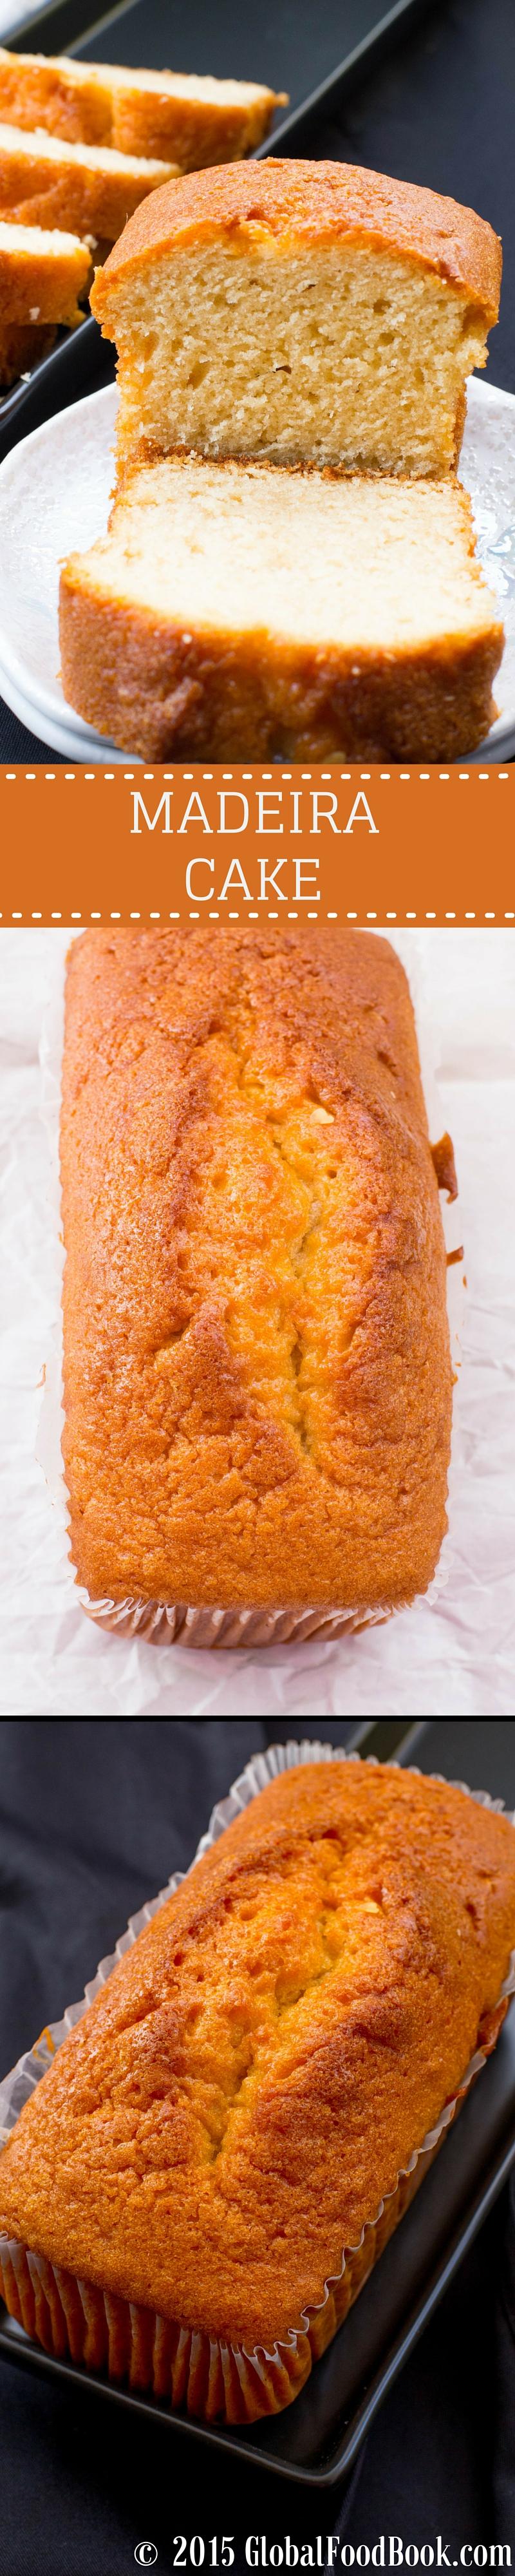 Madeira Cake Mix To Buy